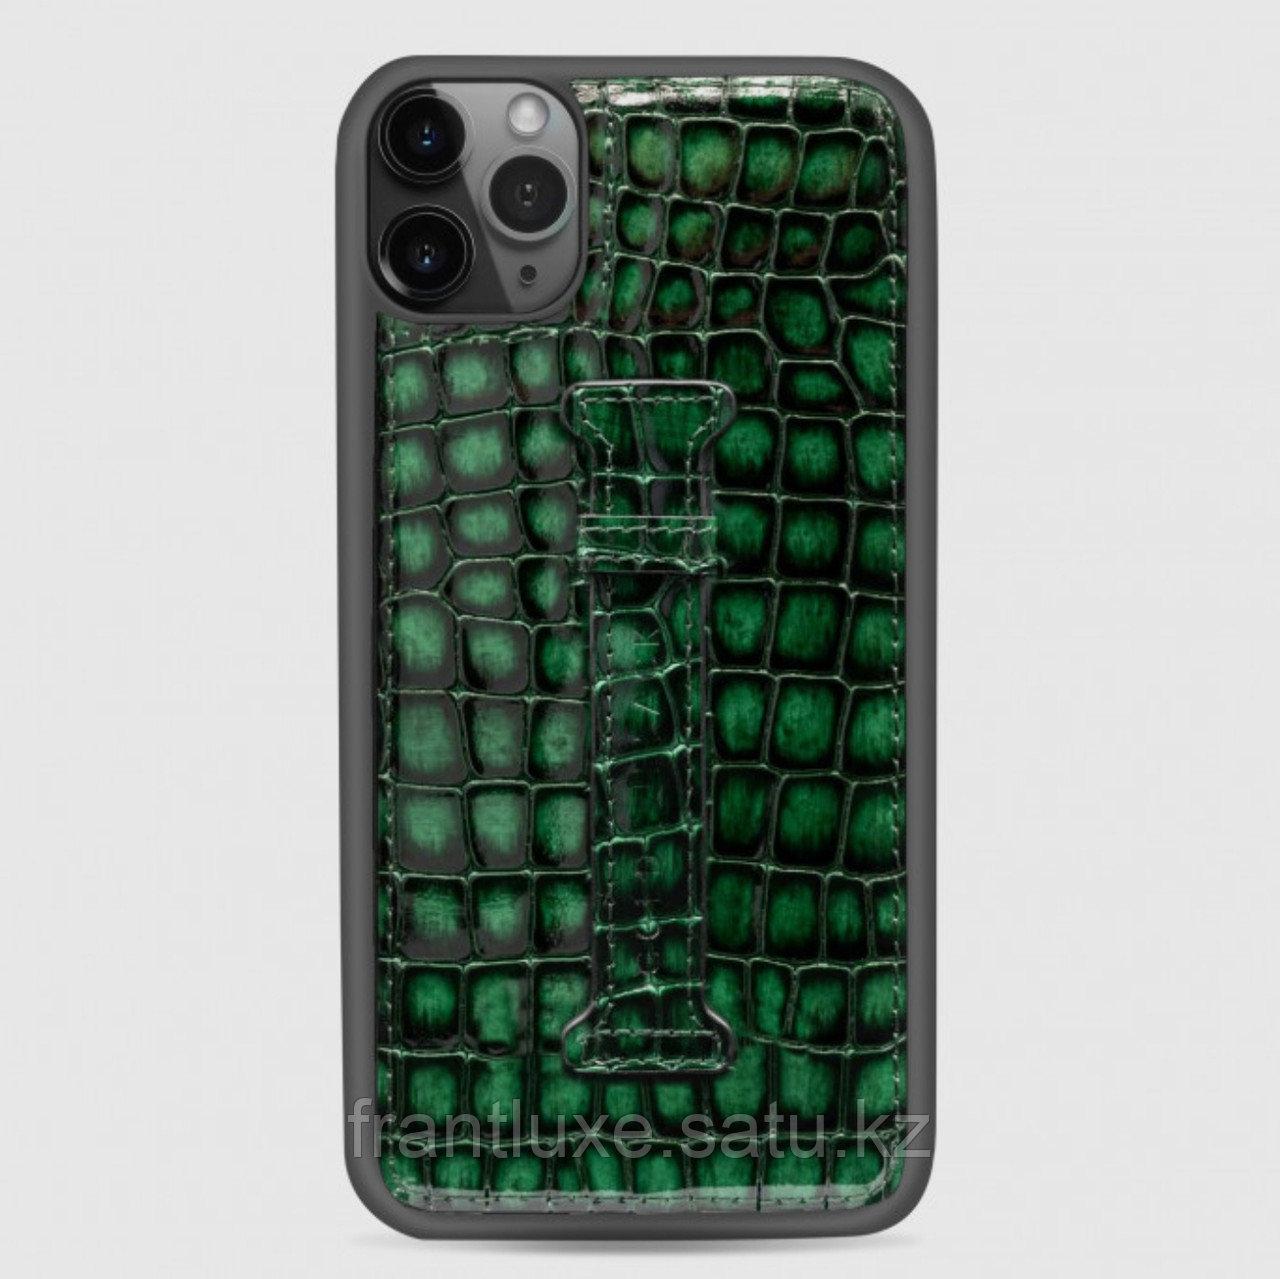 Чехол для телефона iPhone 11 Pro Max Finger-holder Green - фото 1